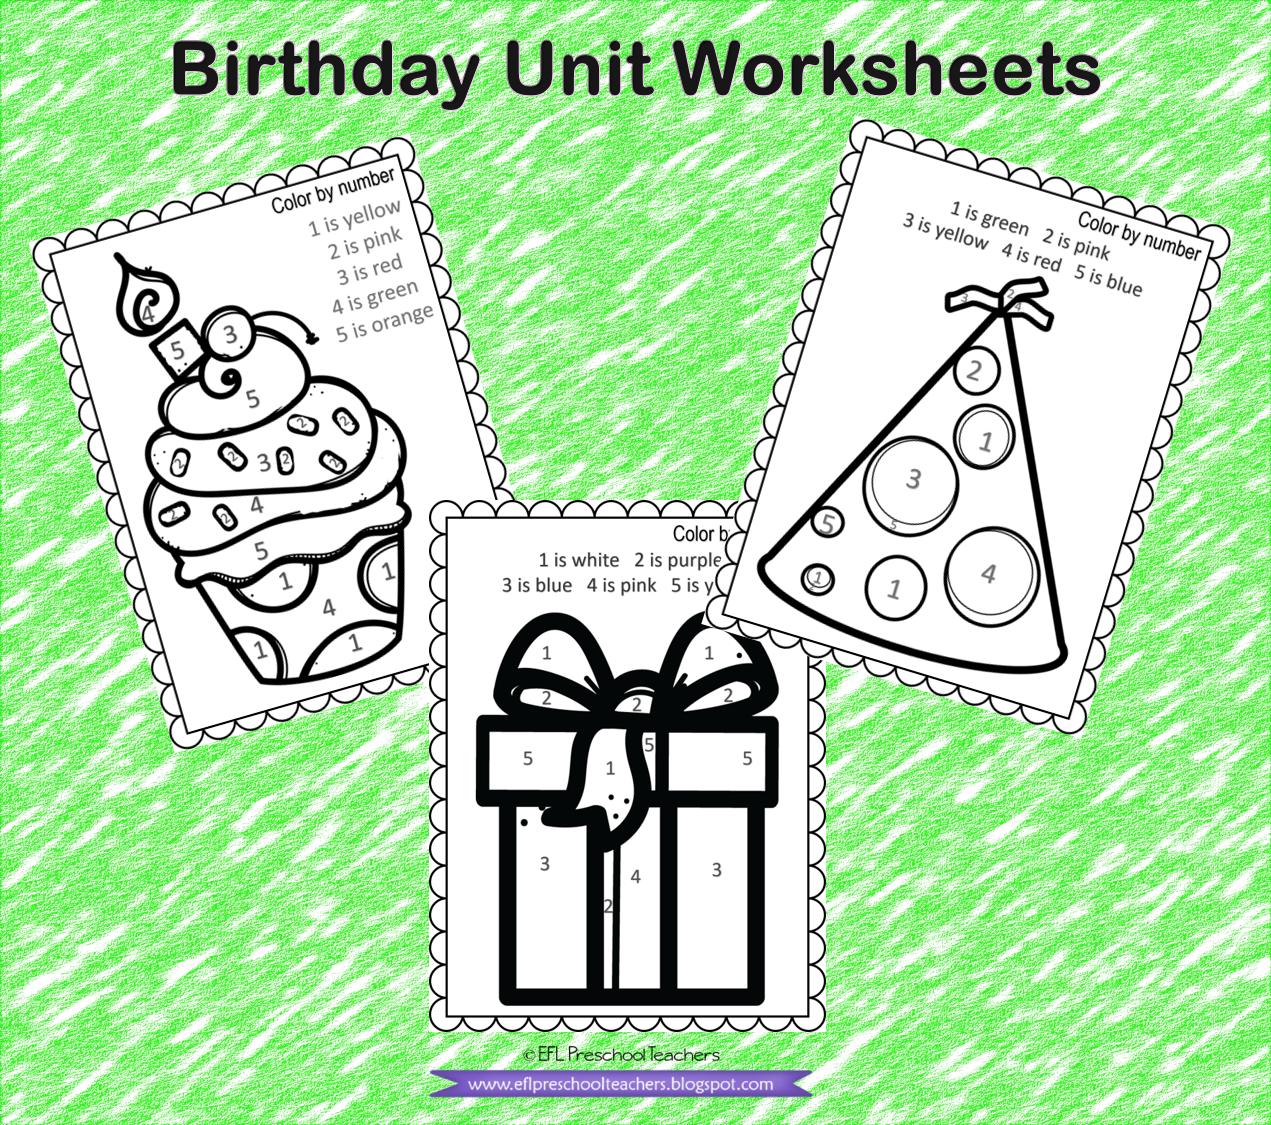 Birthday Unit Worksheets For Kindergarten Ell In 2021 Kindergarten Worksheets Worksheets Kindergarten Ell [ 1125 x 1271 Pixel ]